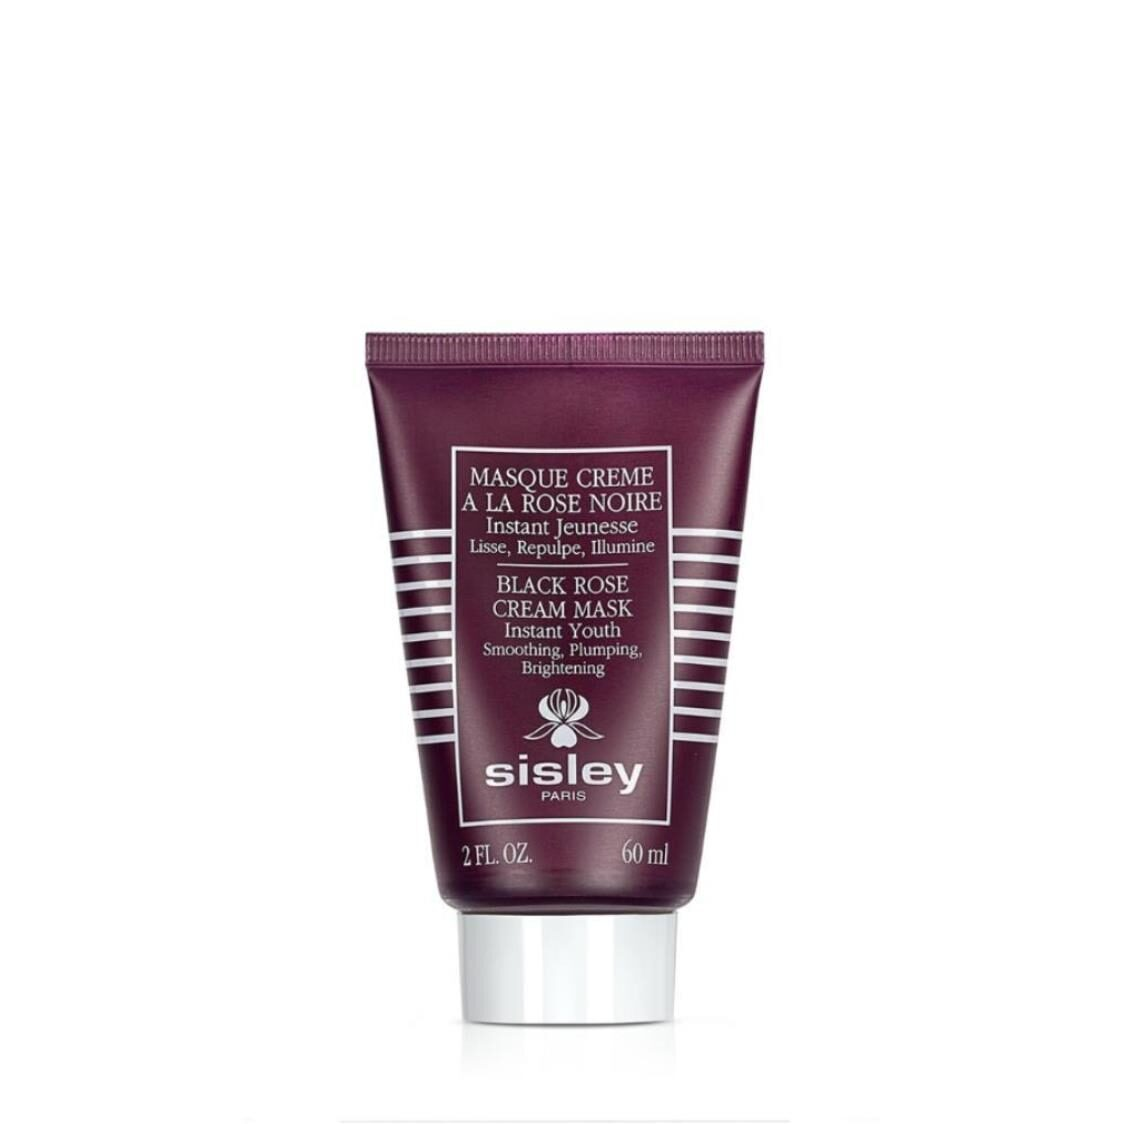 Sisley Black Rose Cream Mask 60ml